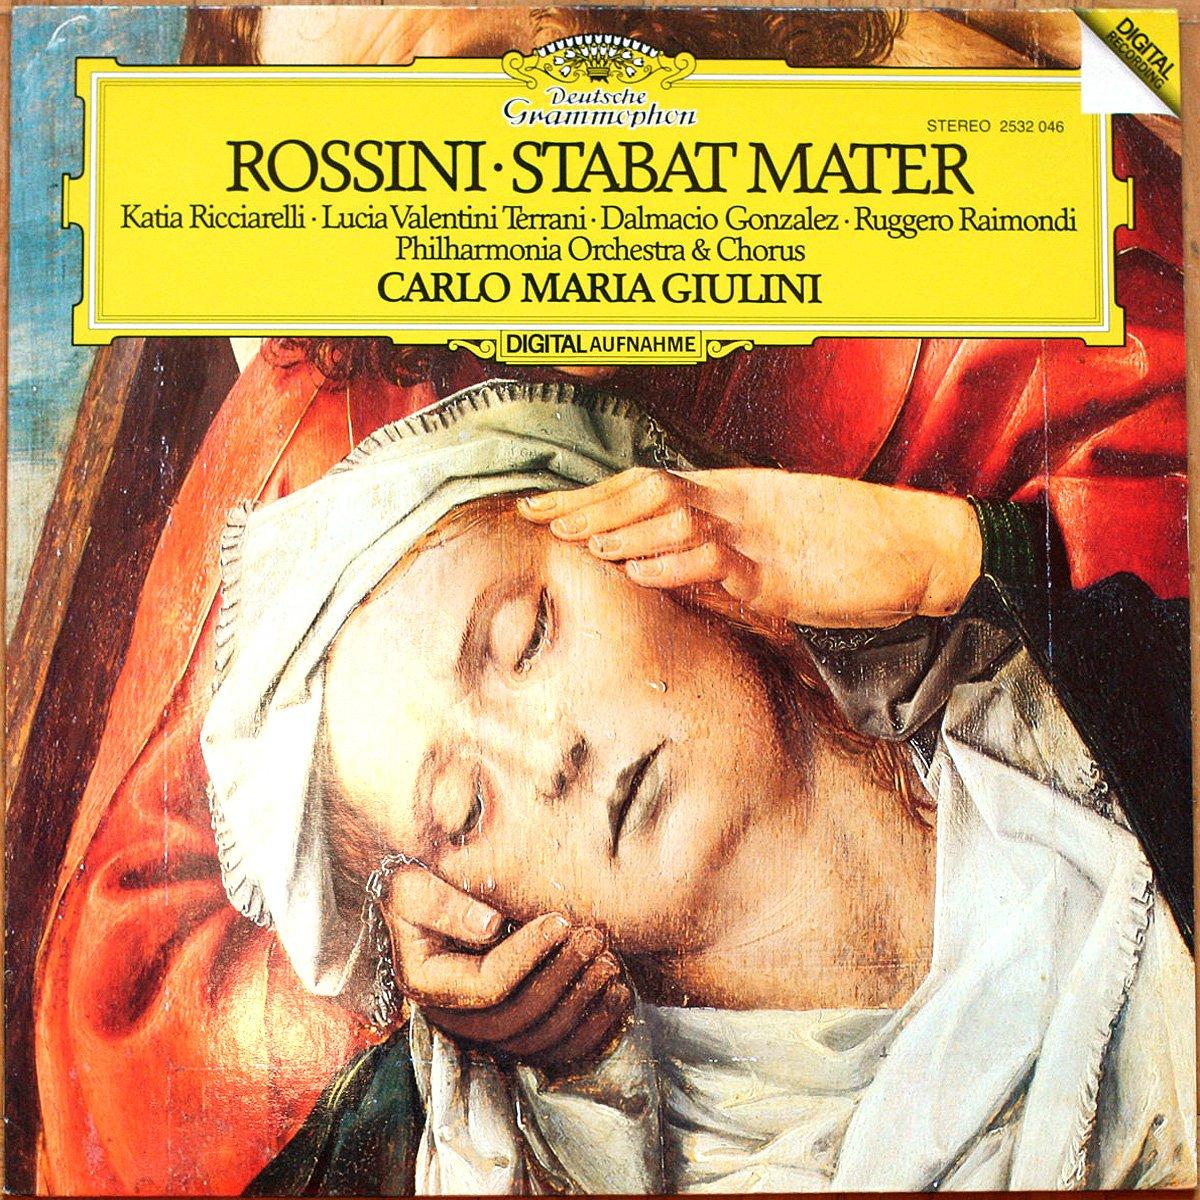 DGG 2532046 Rossini Stabat Mater Giulini DGG Digital Aufnahme